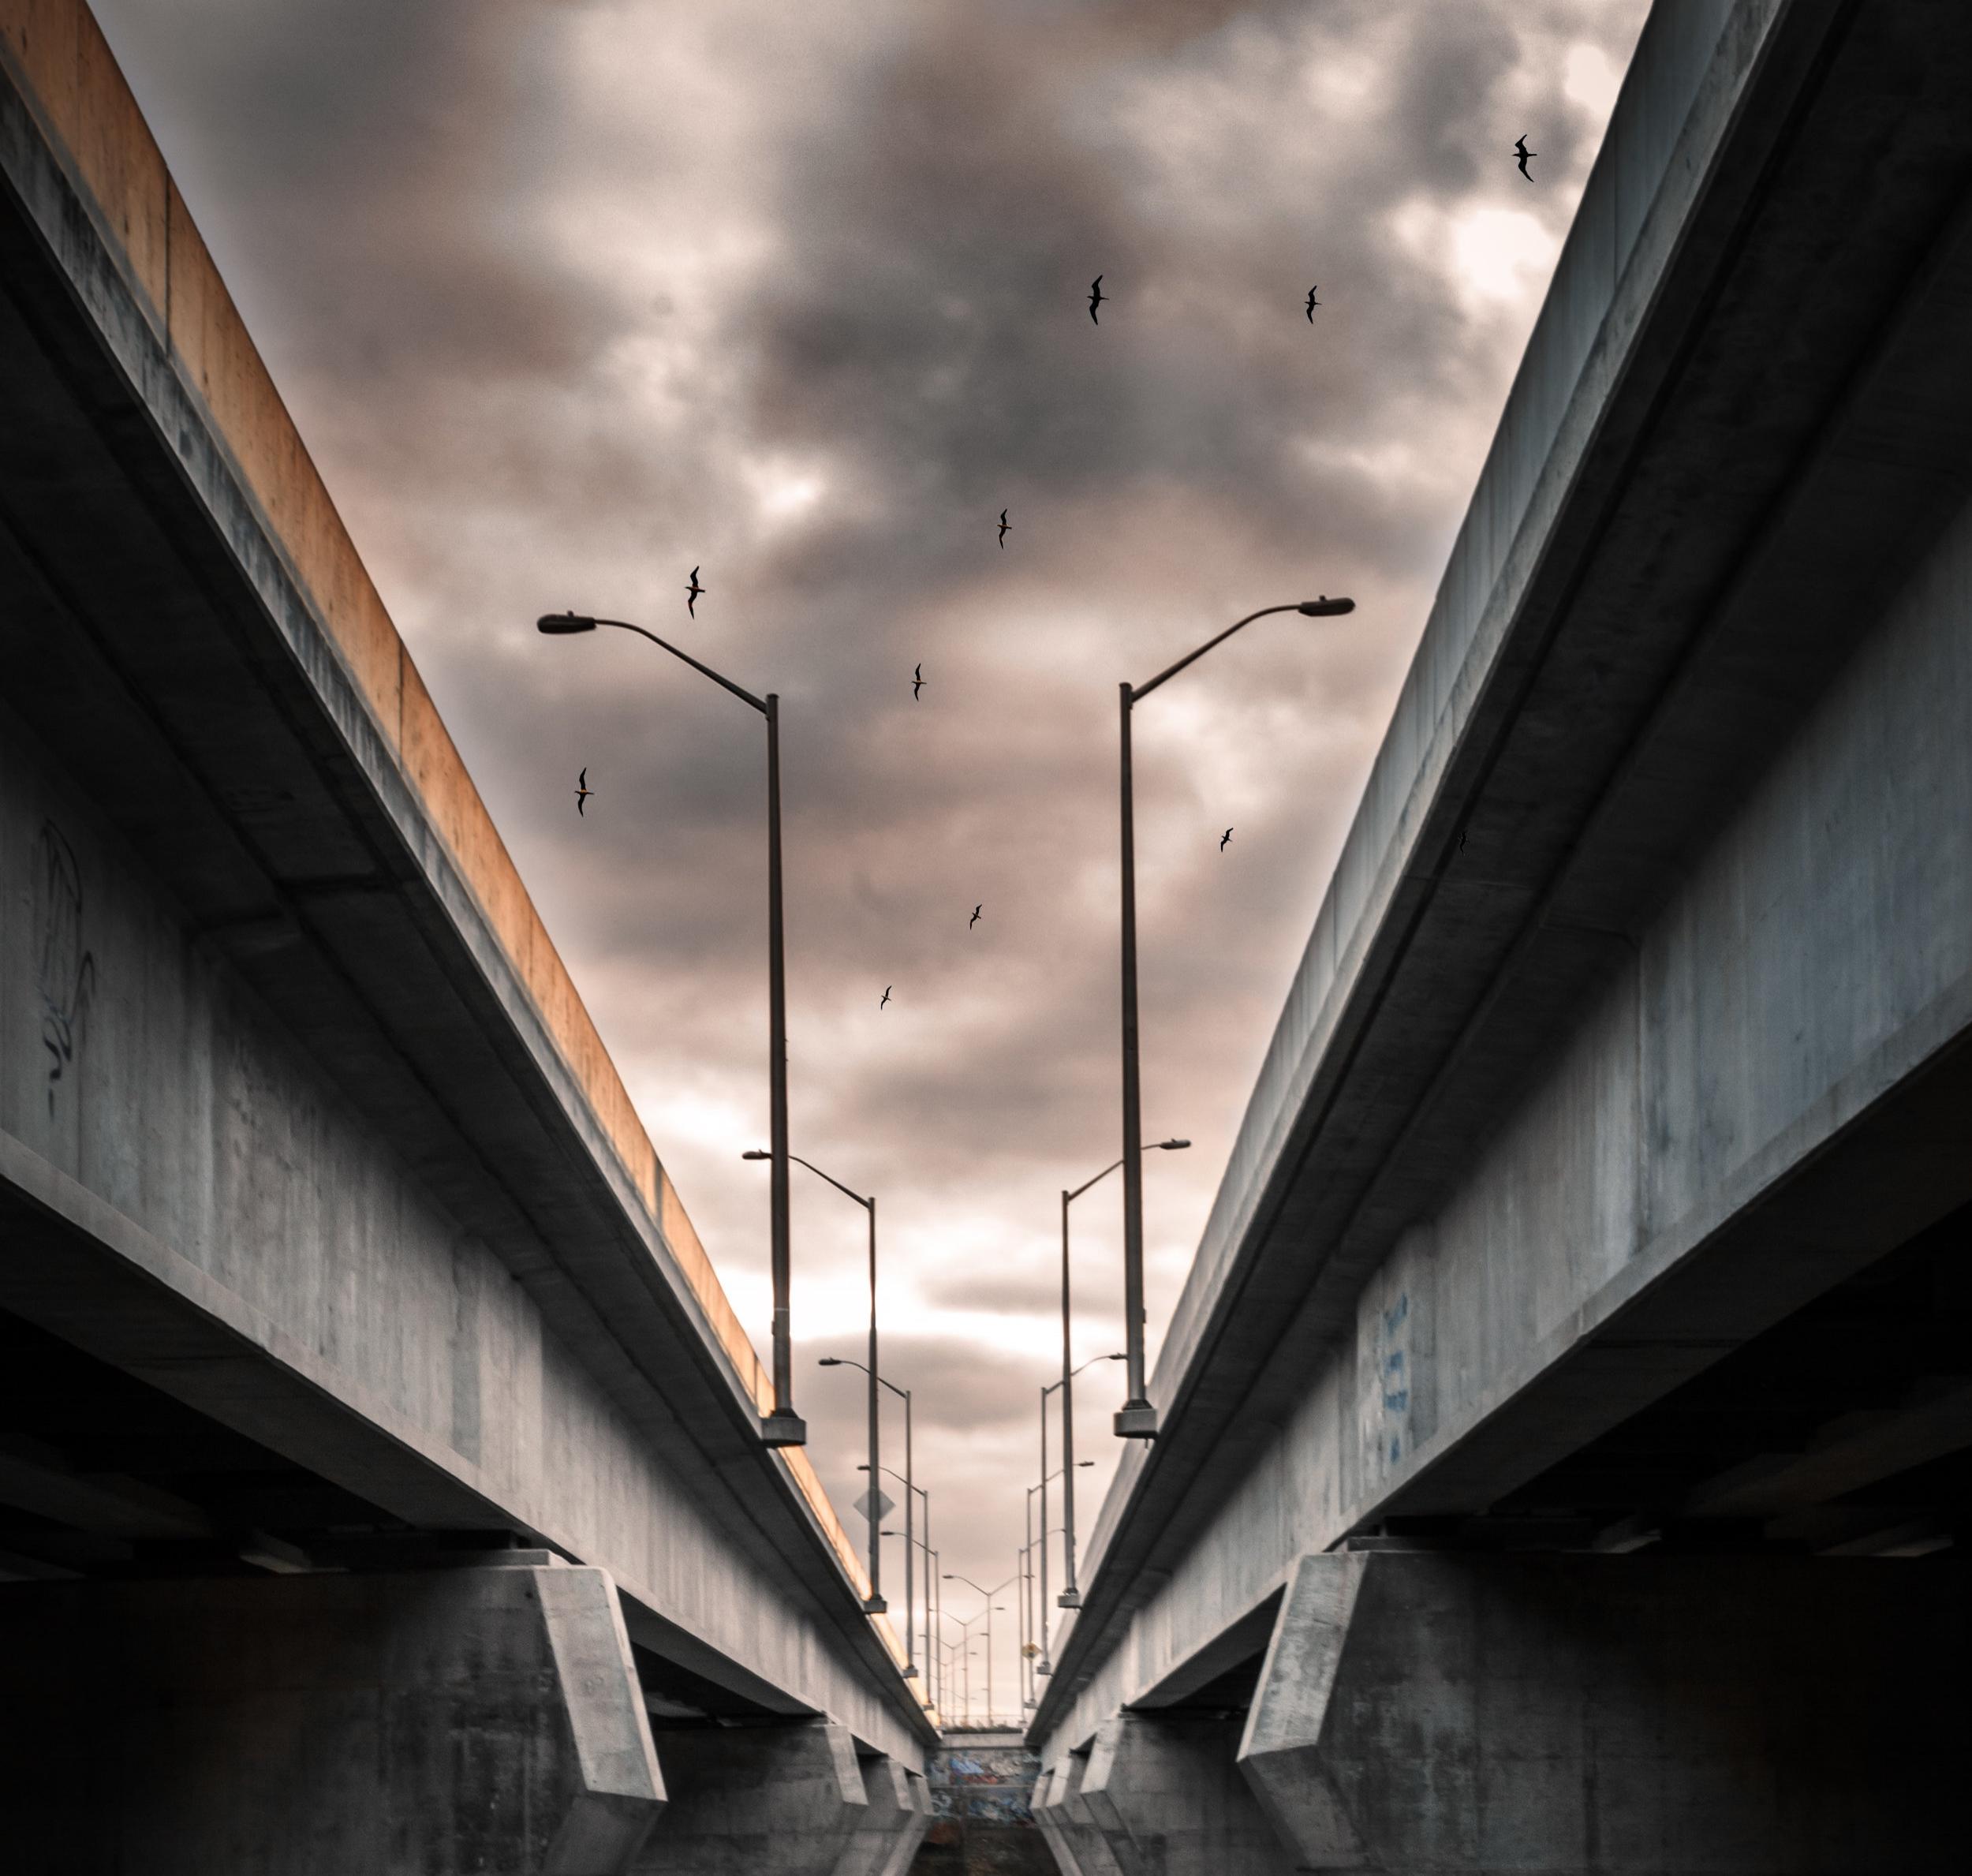 Street and roadway lighting